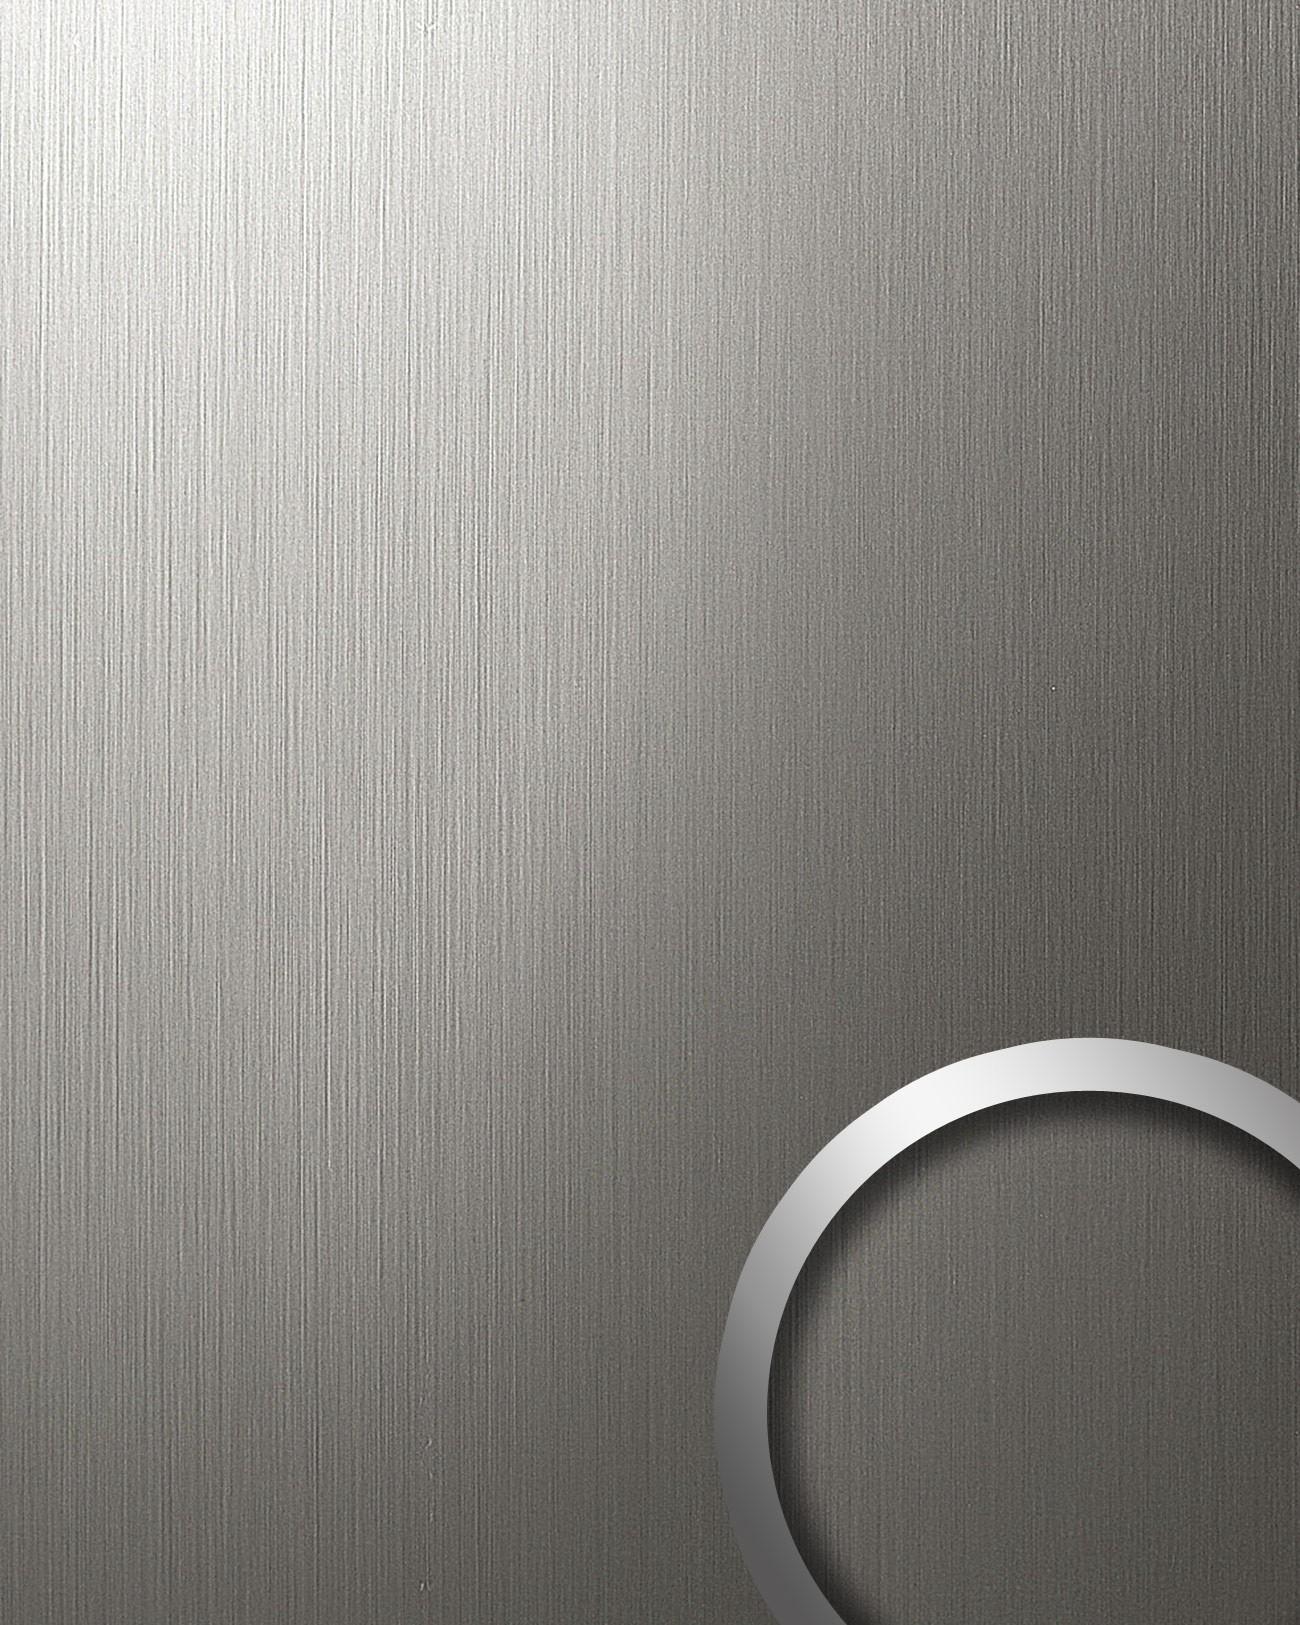 Wandbekleding roestvrij staal look grijs mat zelfklevend 2 60 m2 wallface 15297 deco origineel - Wandbekleding keuken roestvrij staal ...